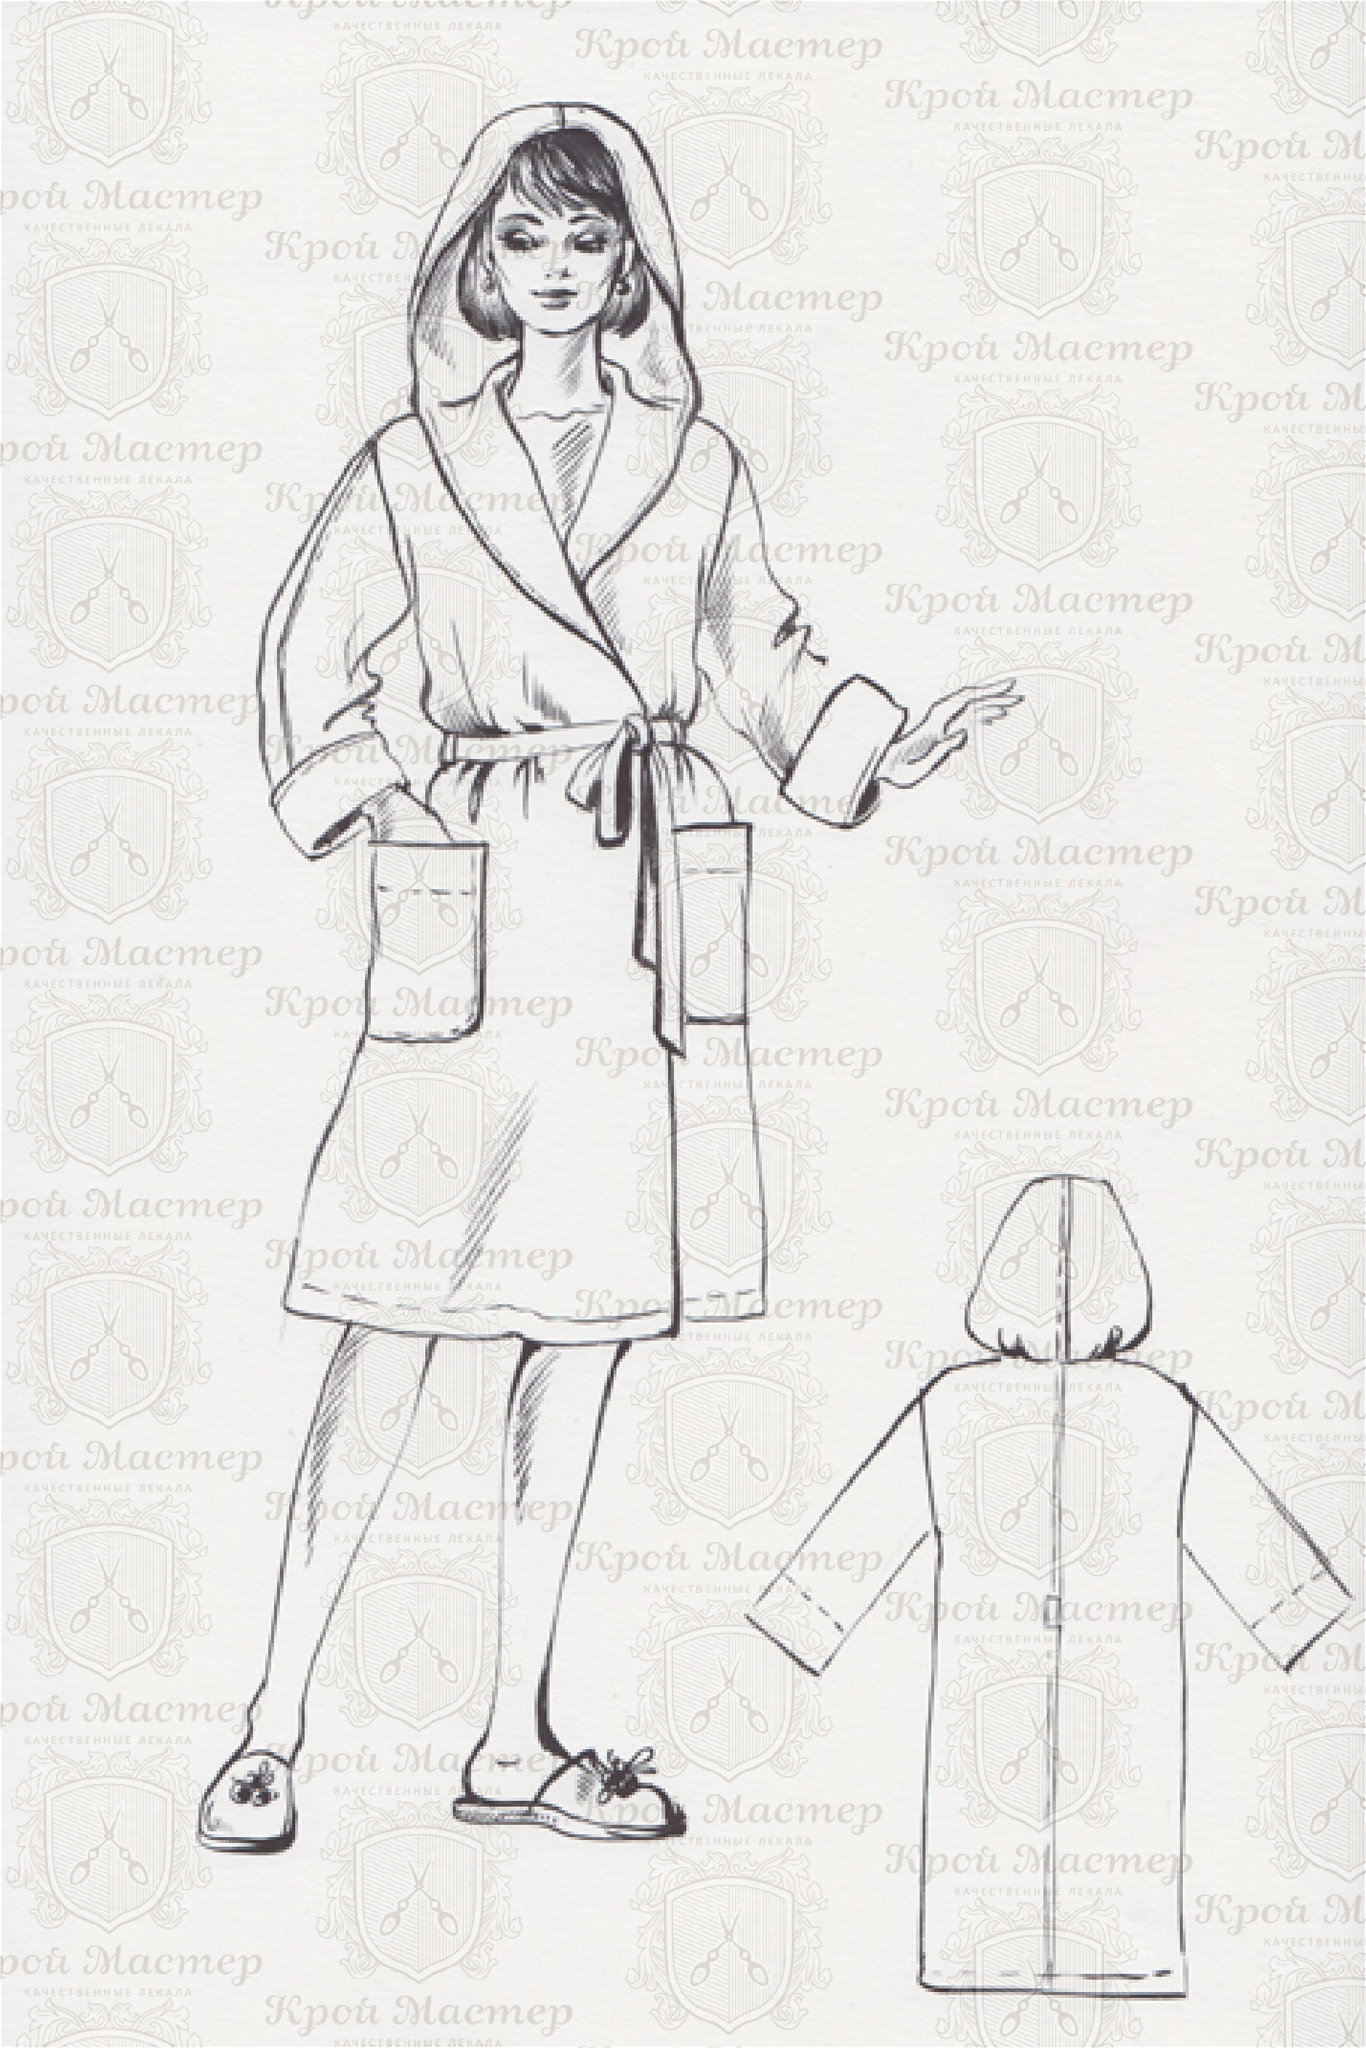 Лекала запашного халата с капюшоном до колена